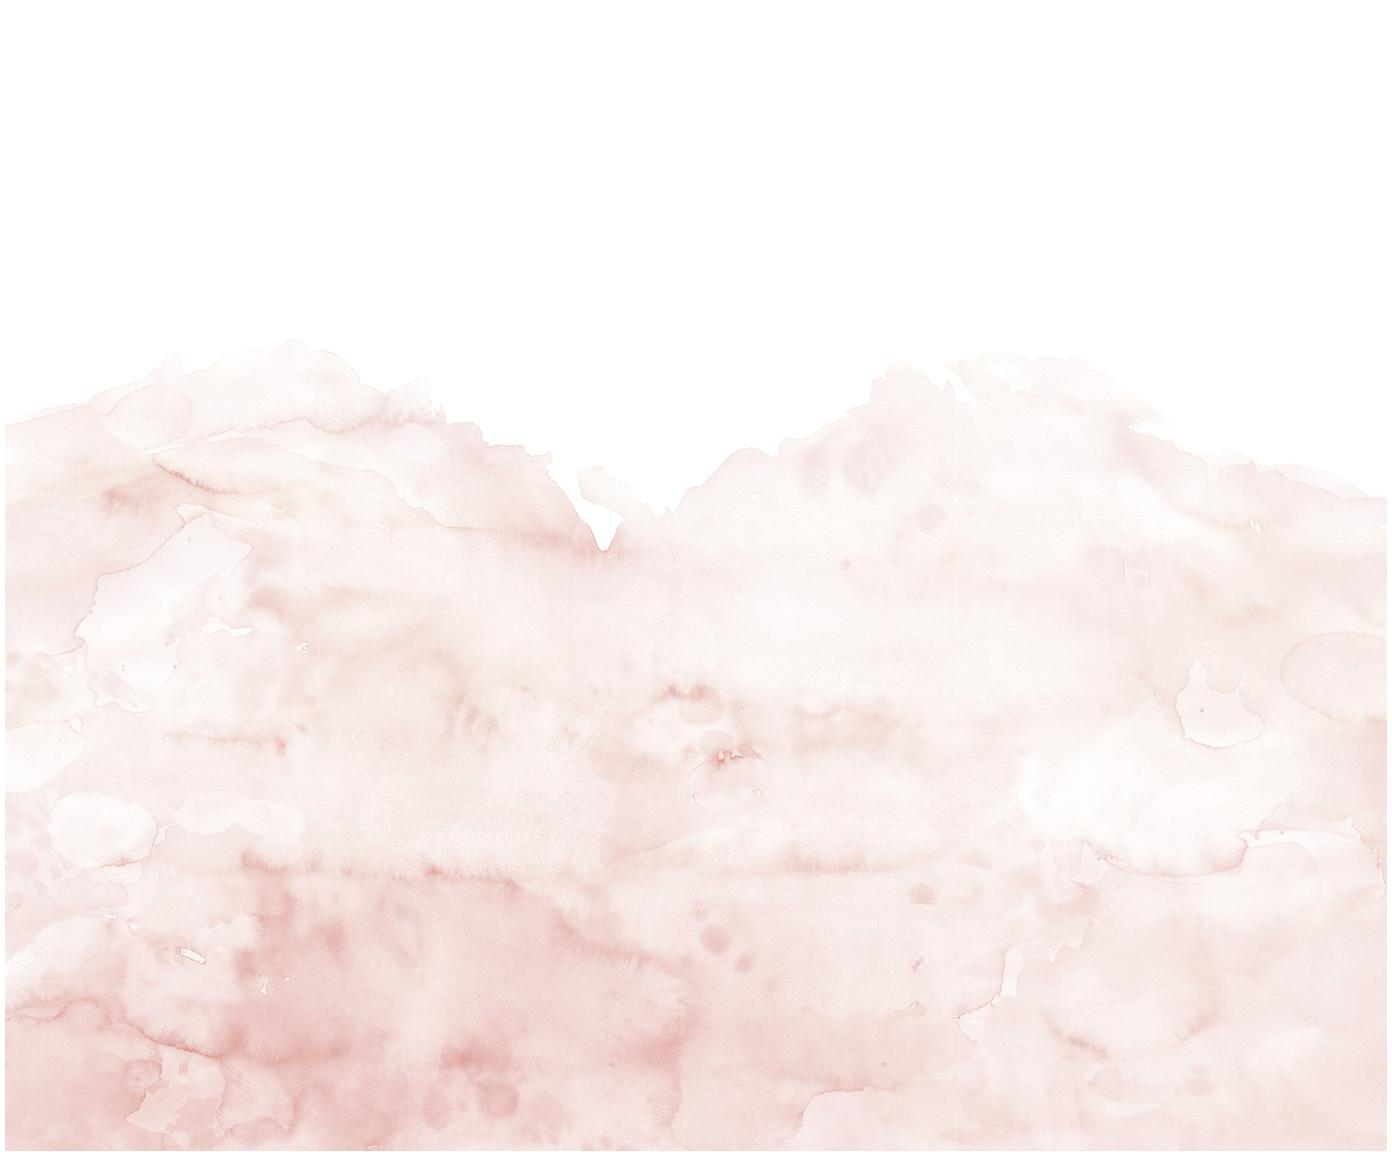 Fotobehang Pink Clouds, Vlies, Roze, wit, 372 x 280 cm